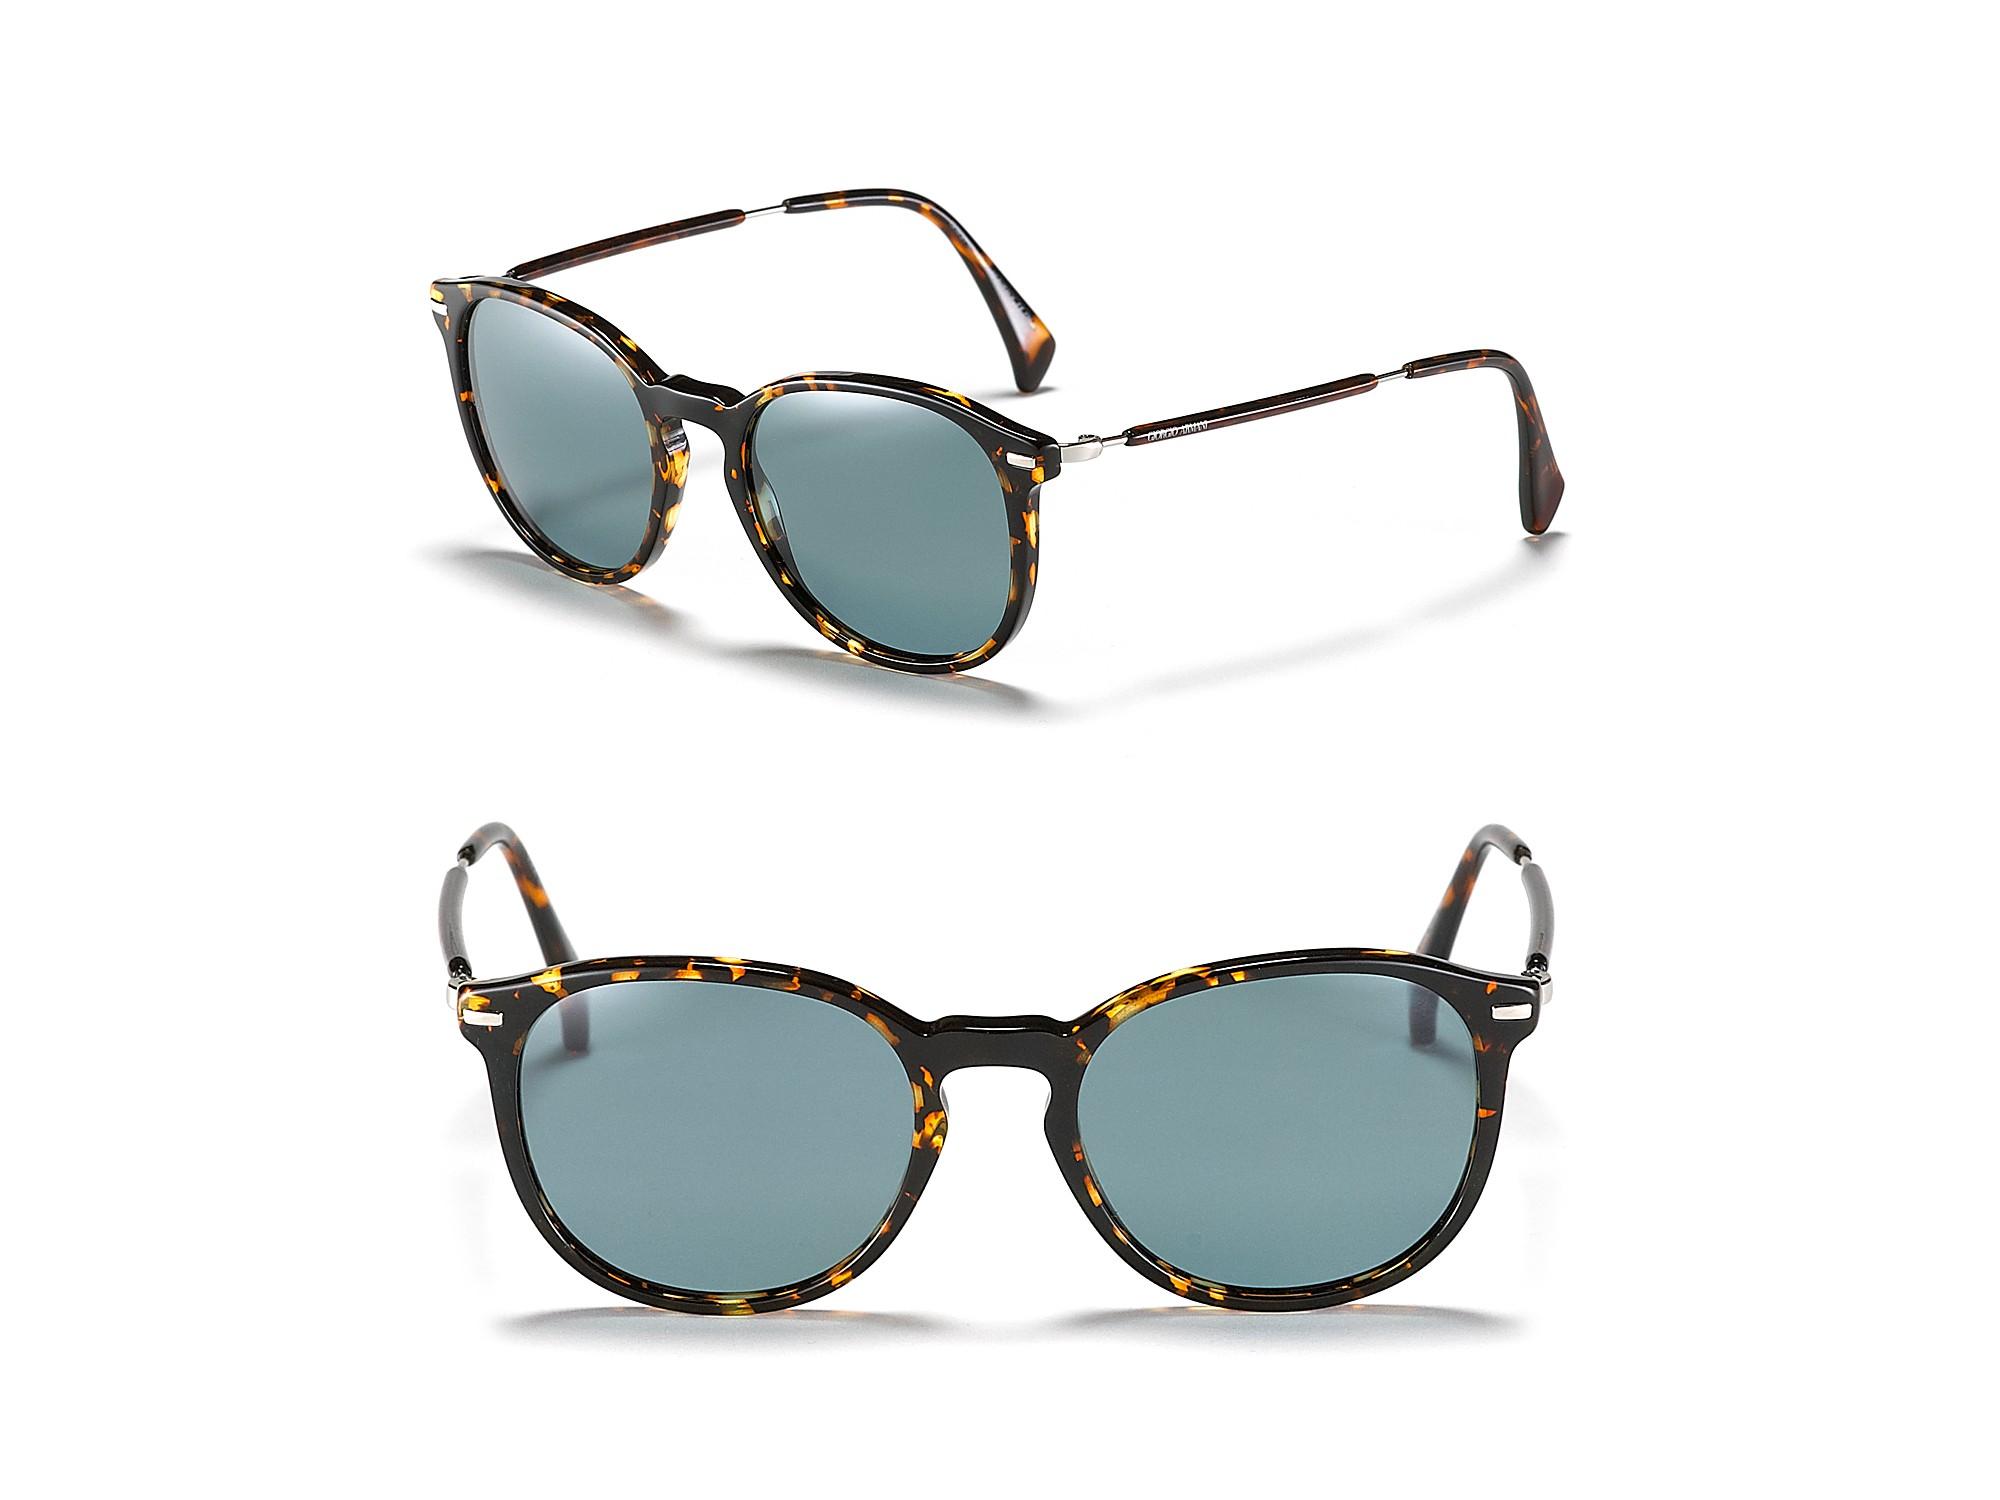 2568a65581f Gucci Havana Rounded Wayfarer Sunglasses